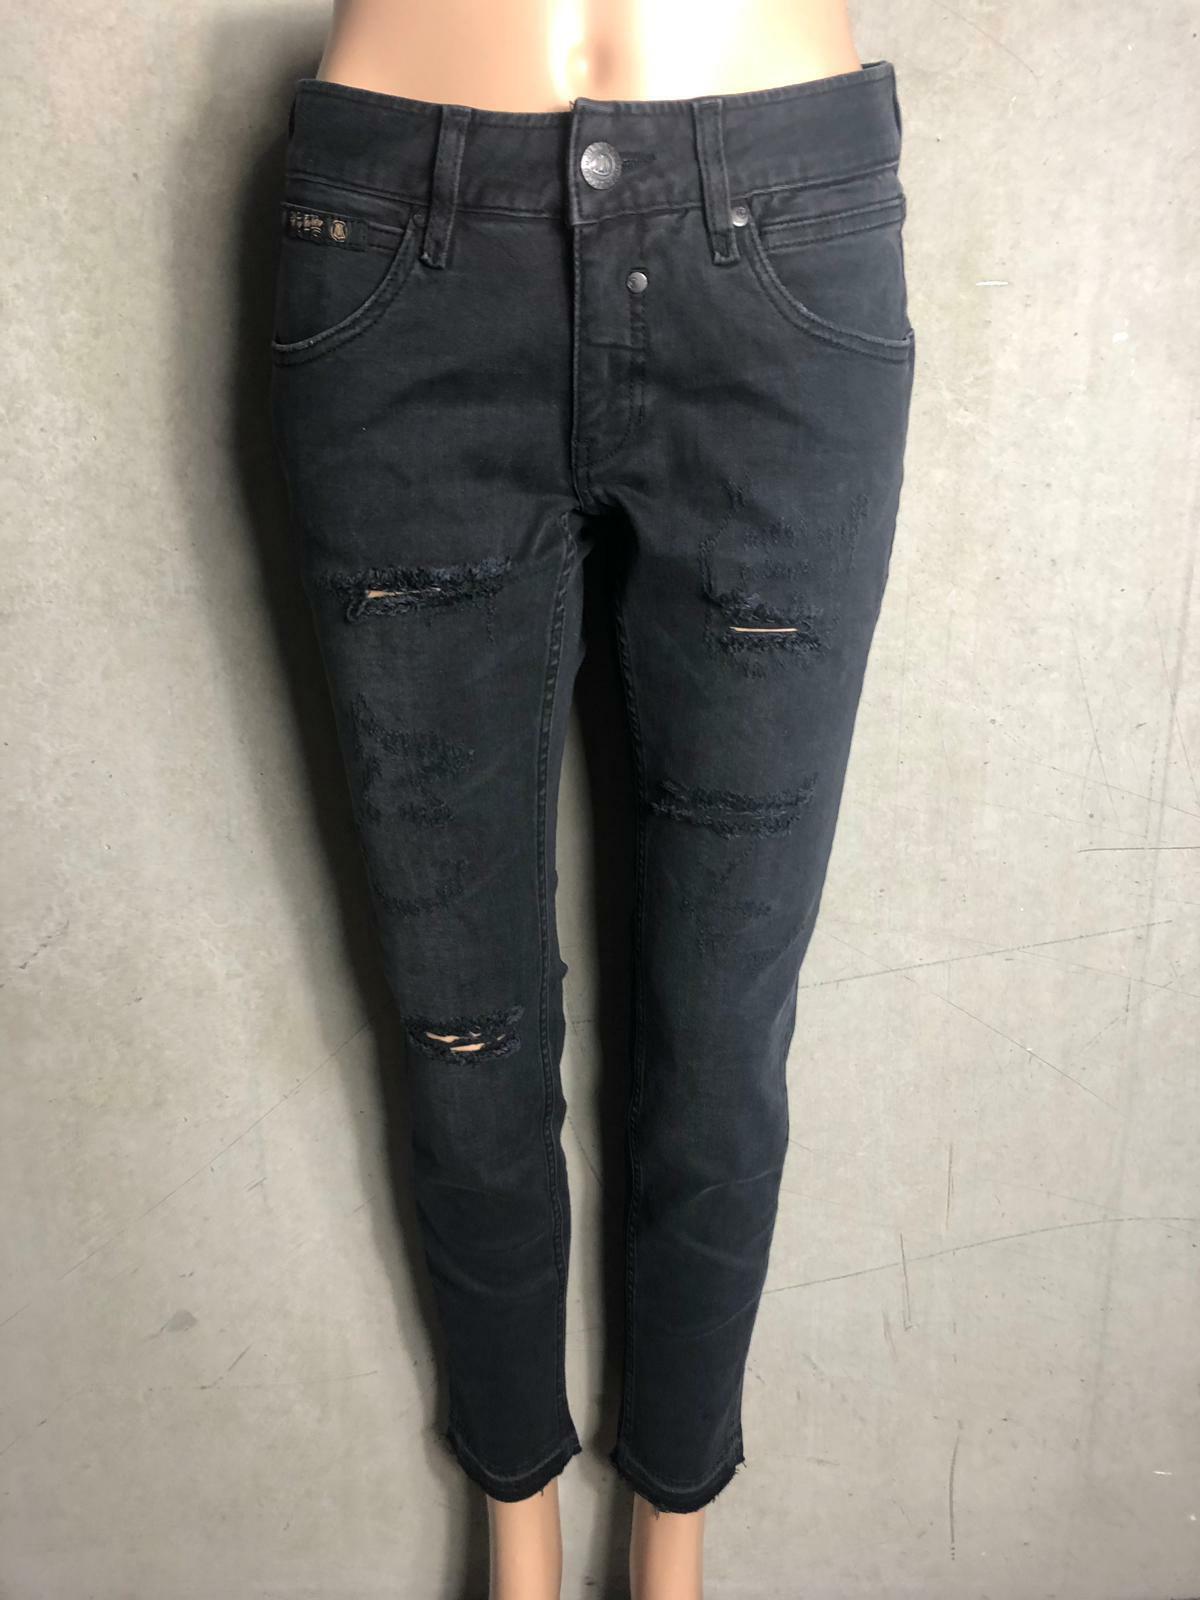 STUNNING-Cool Jeans Touch Crop sschwarz Used Look-New Größe W27 L32 3320j